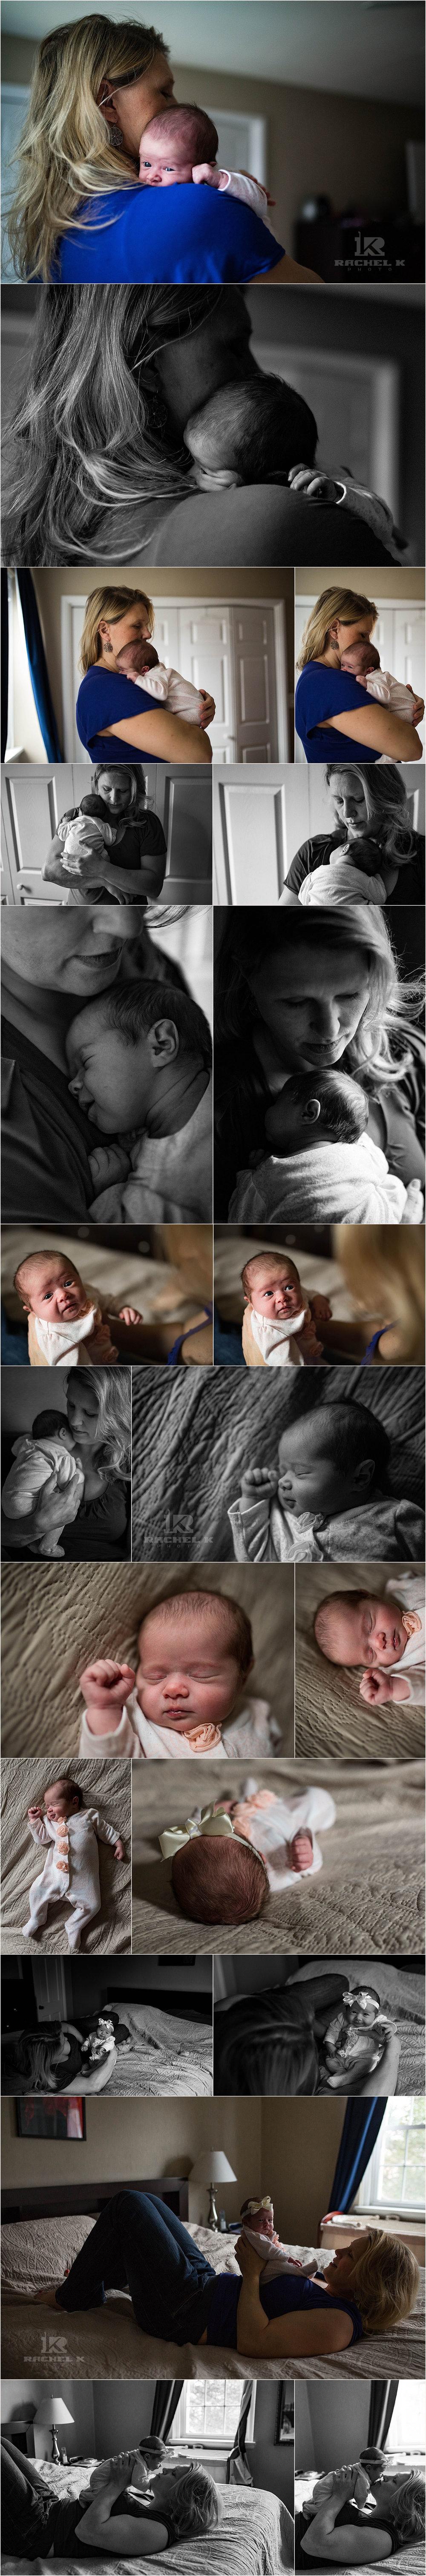 Arlington, VA Newborn lifestyle session by Rachel K Photo